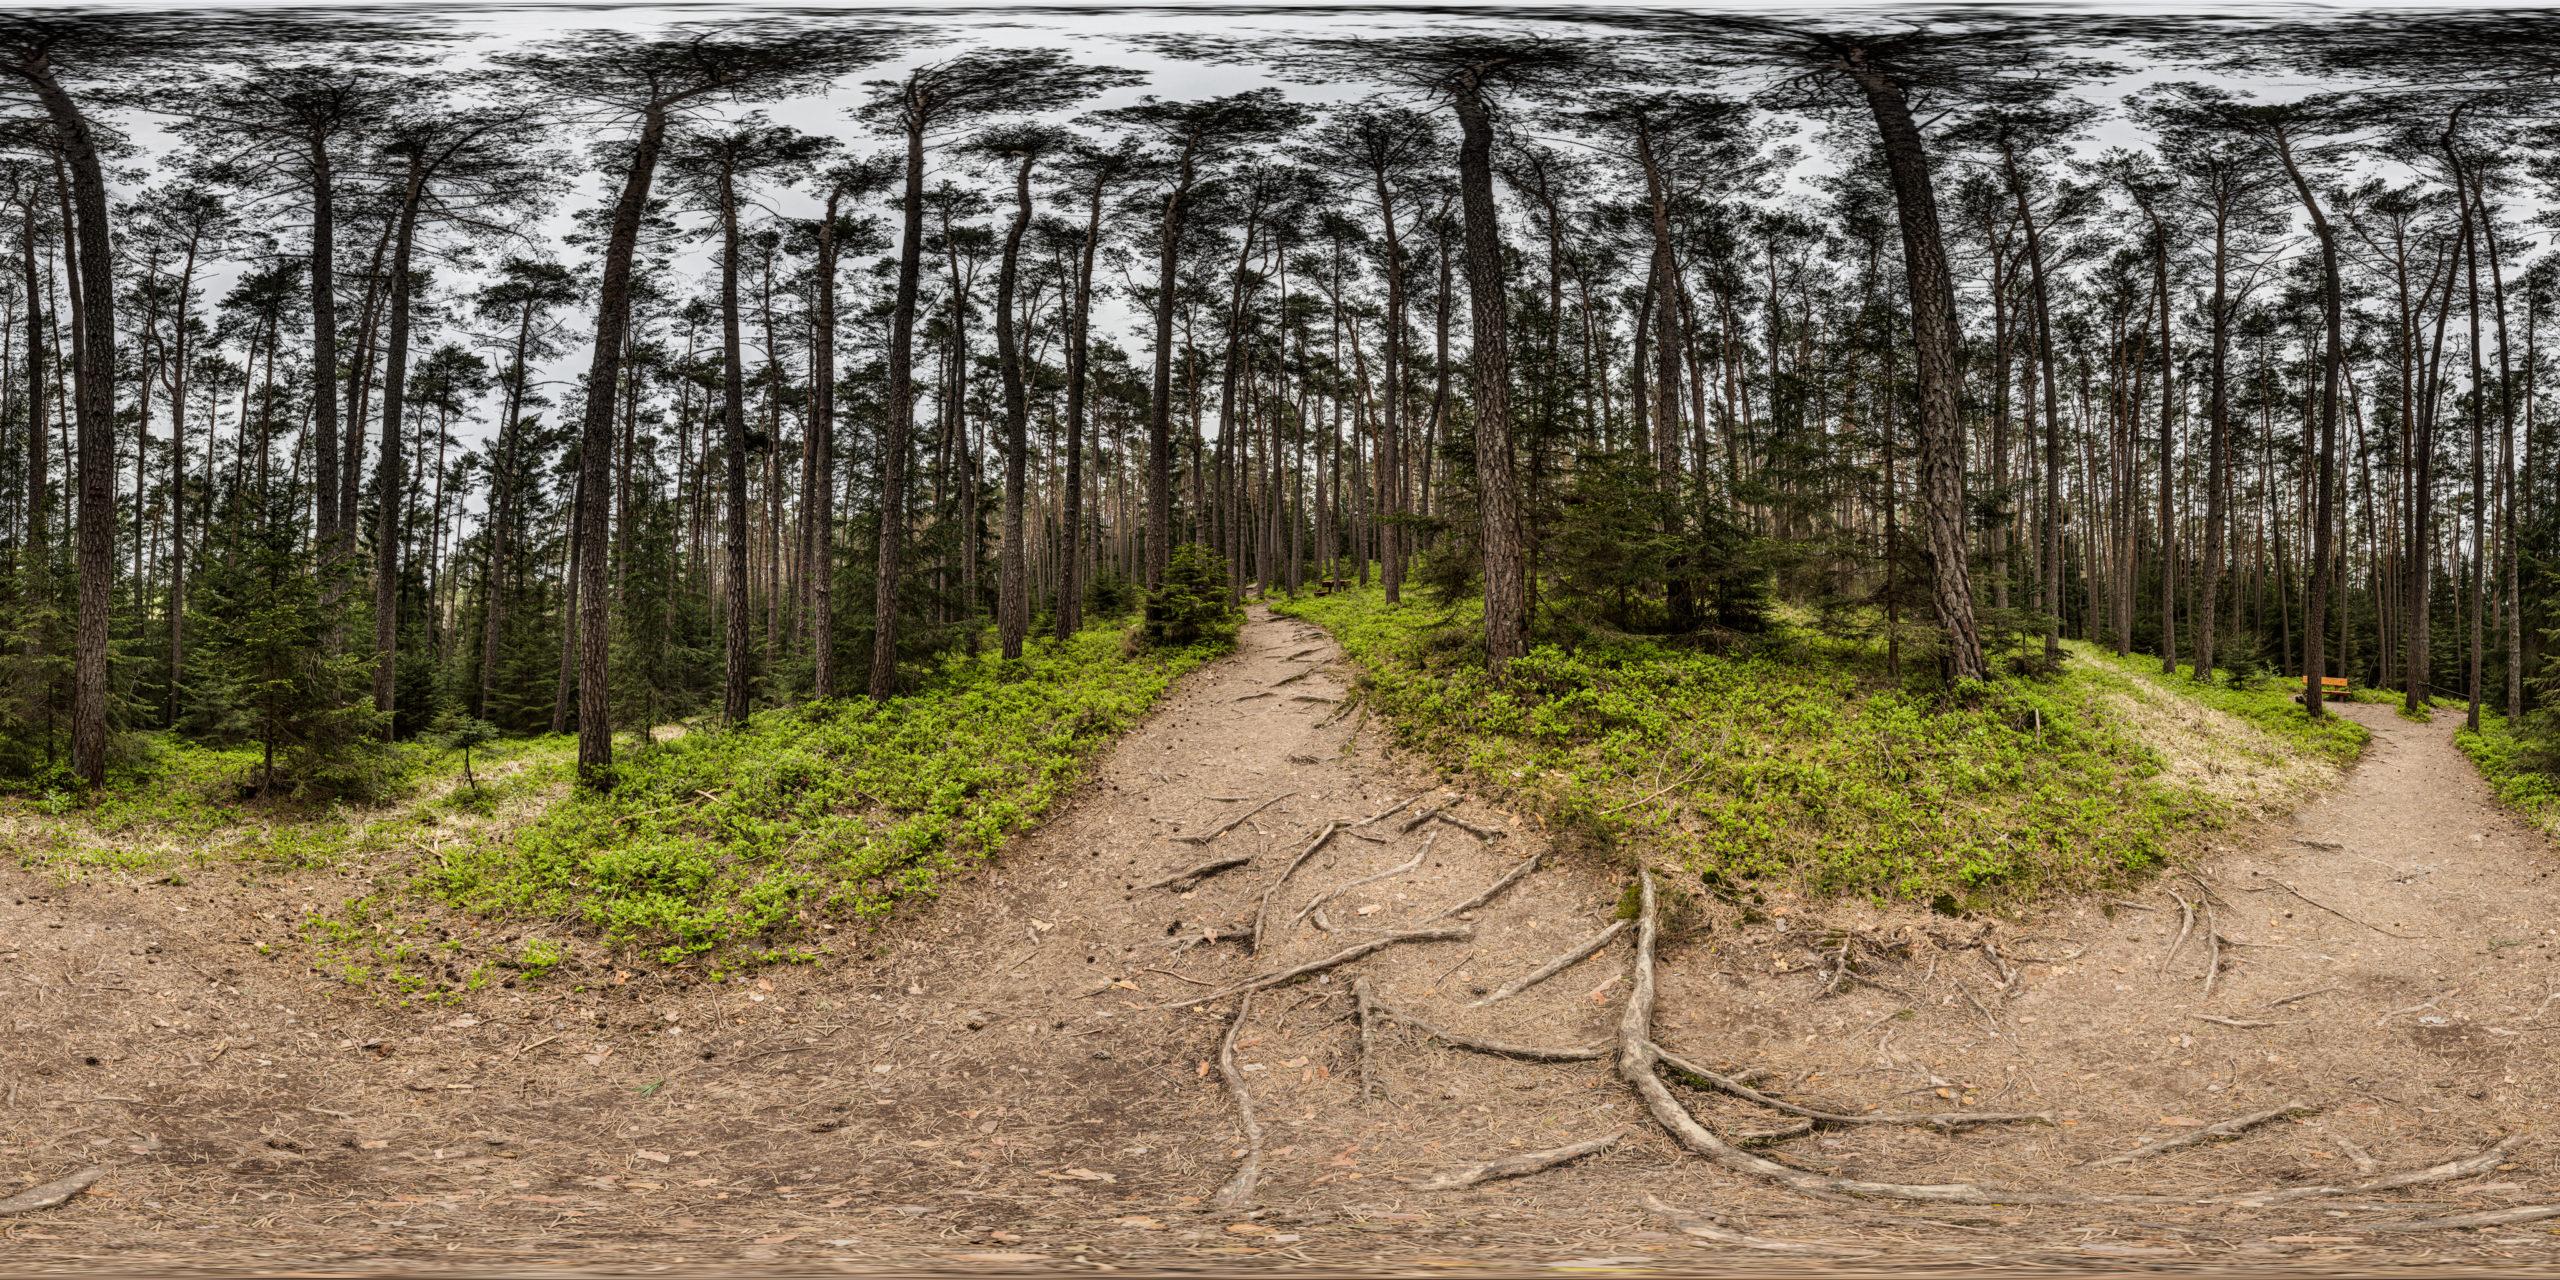 HDRI-Skies-Barefoot-Trail-Path-Brombachsee